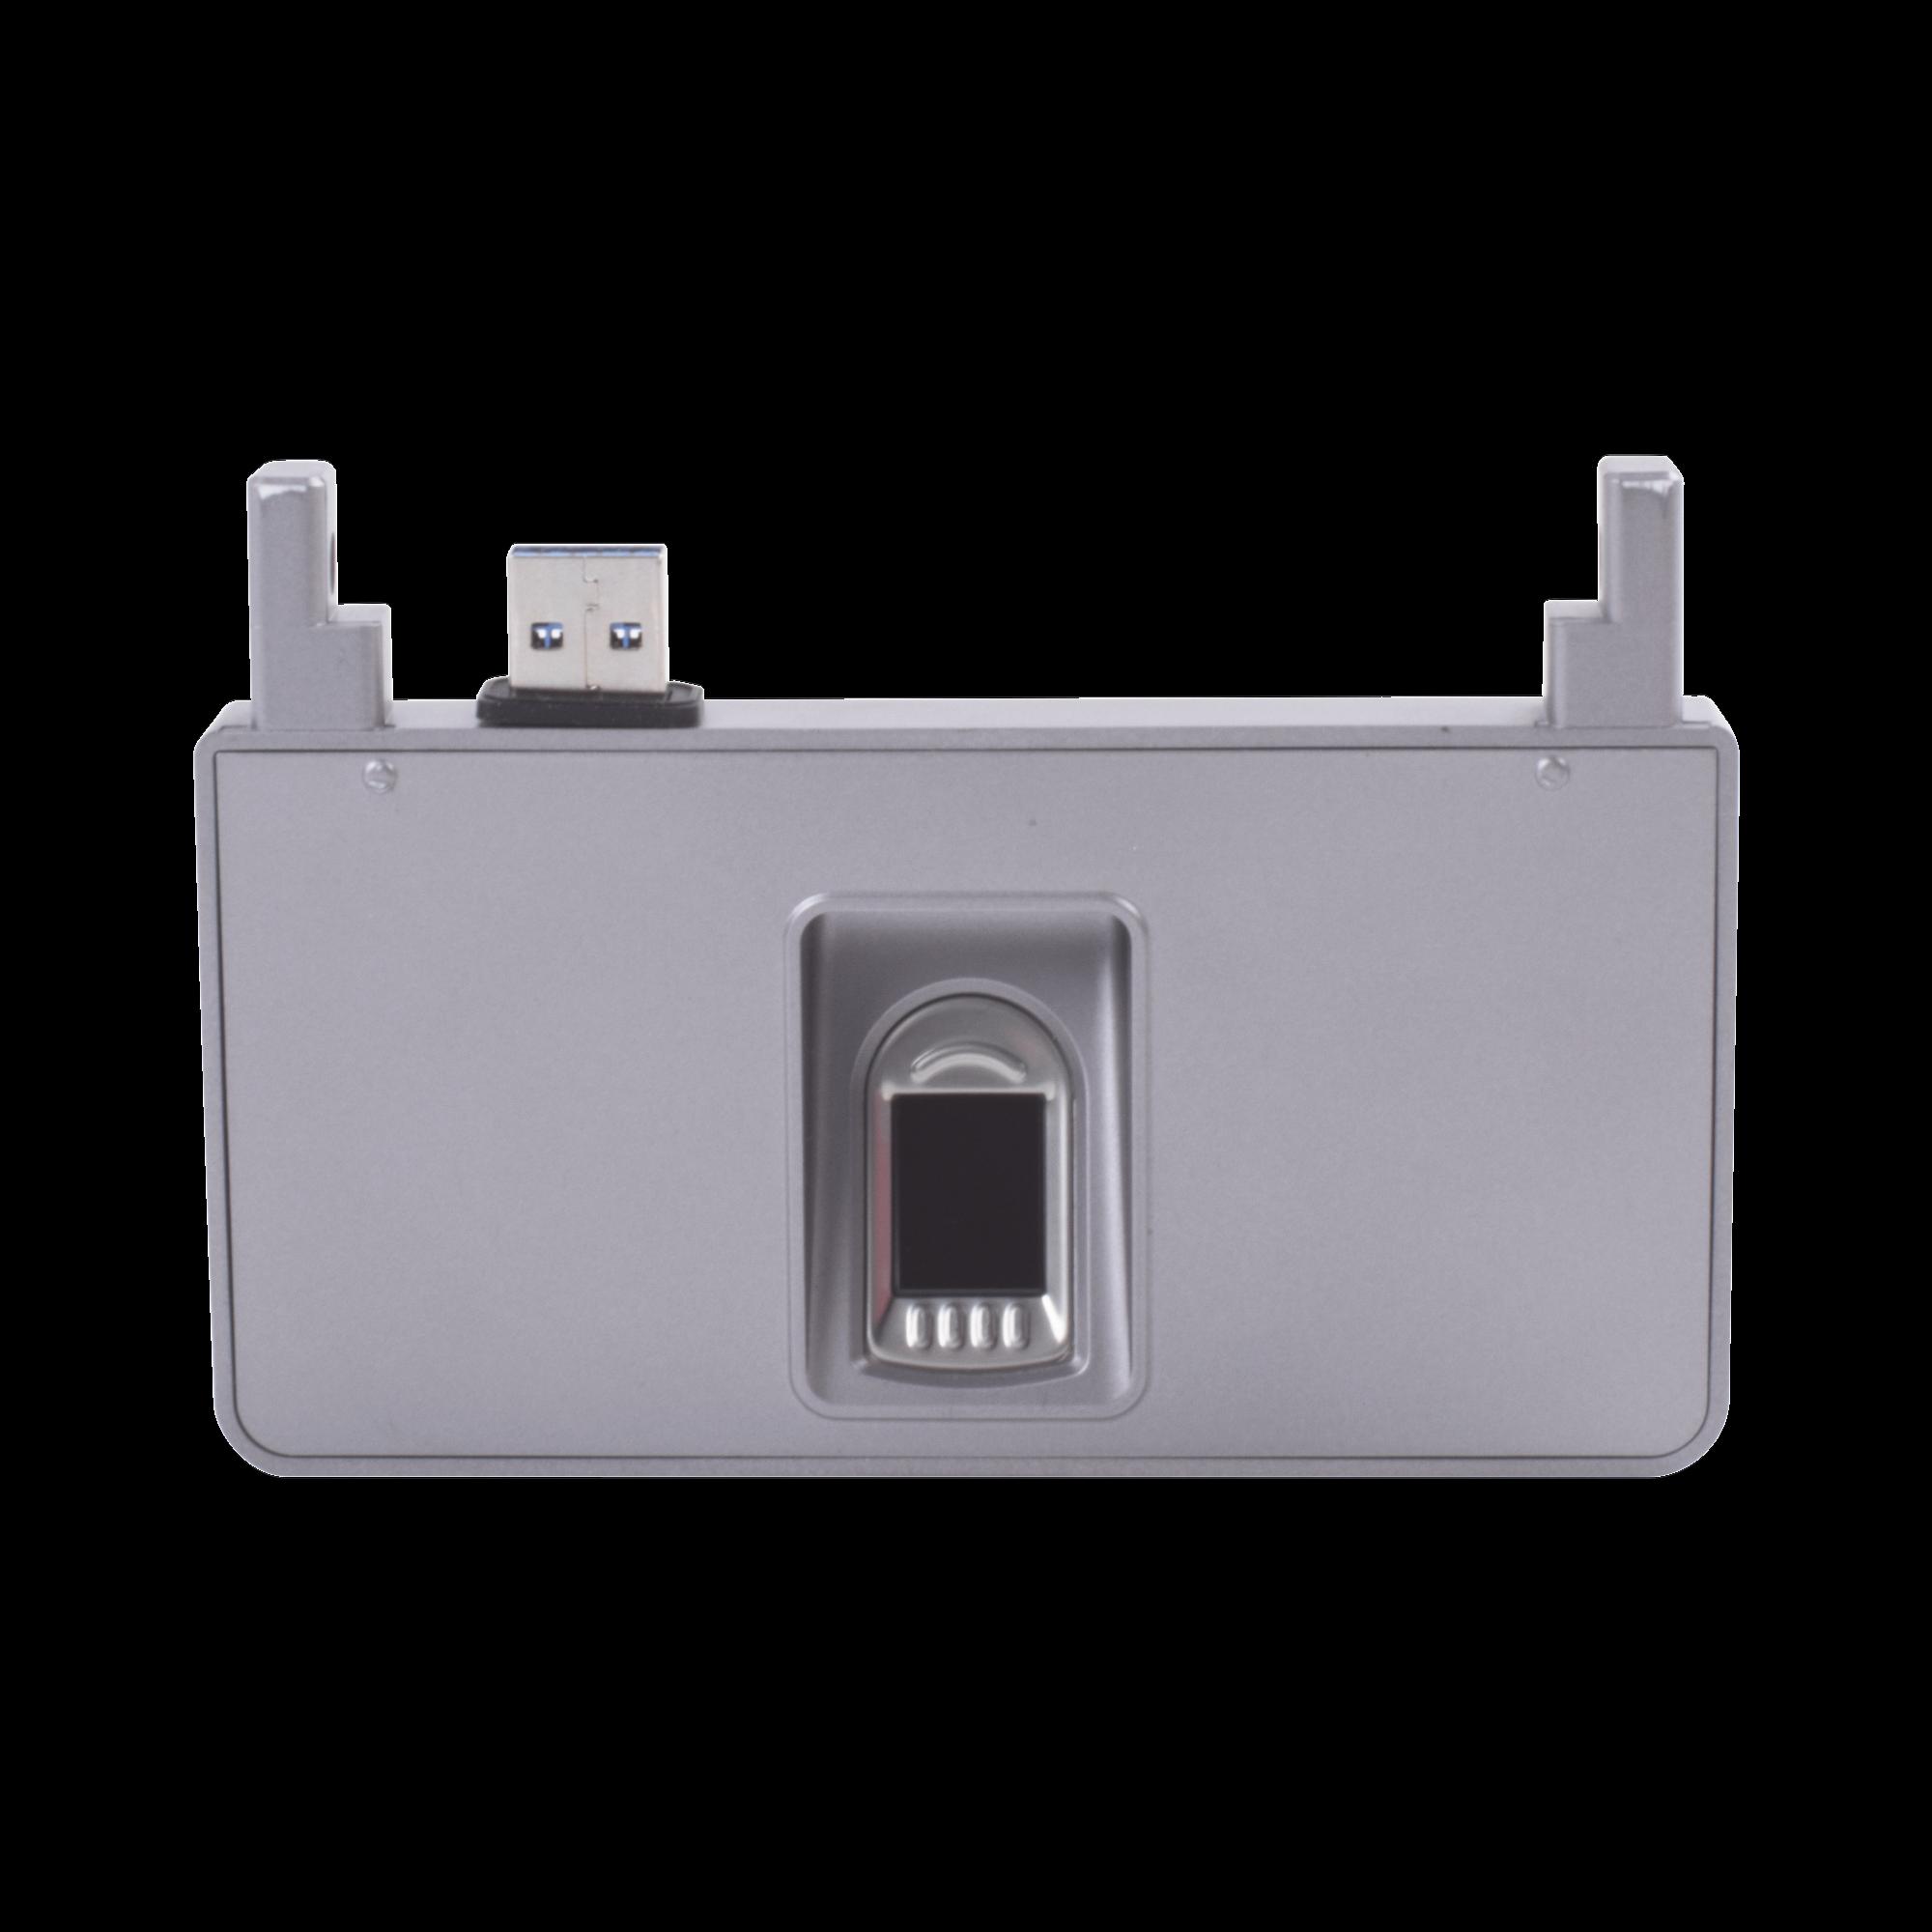 Modulo Lector de Huella para Biometrico DS-K1T607E y DS-K1T671M / Facil Integracion Plug & Play